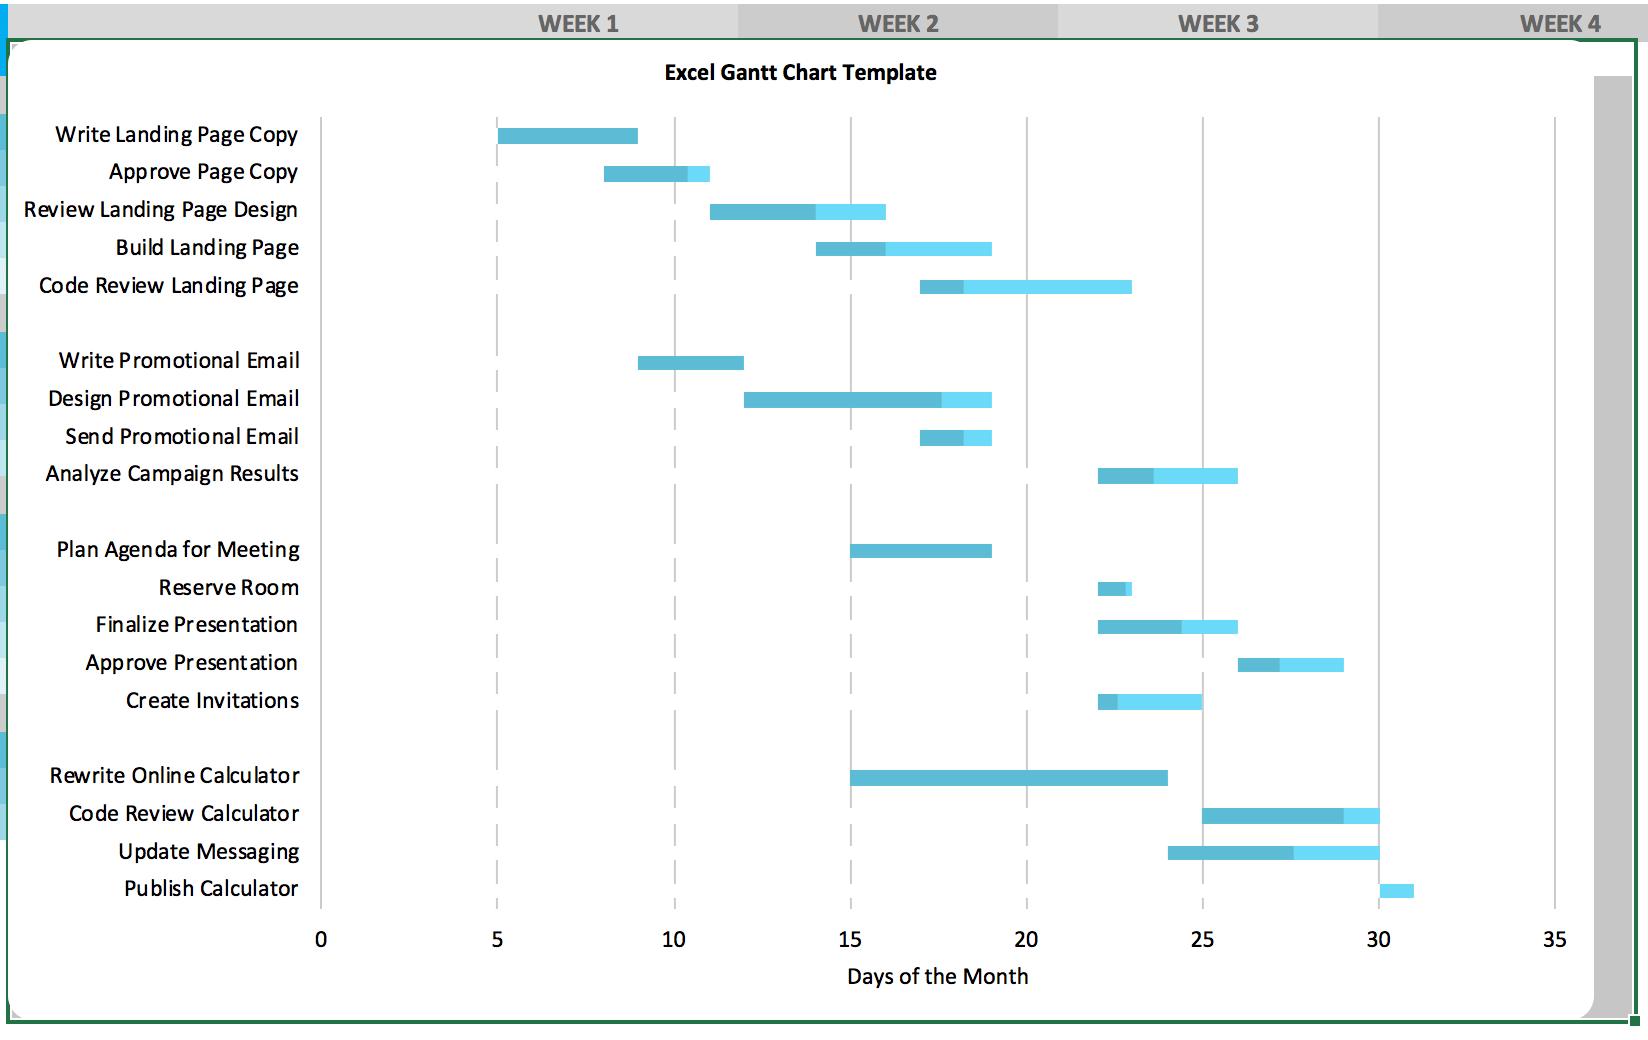 Free Gantt Chart Excel Template: Download Now | Teamgantt In Gantt Chart Template Online